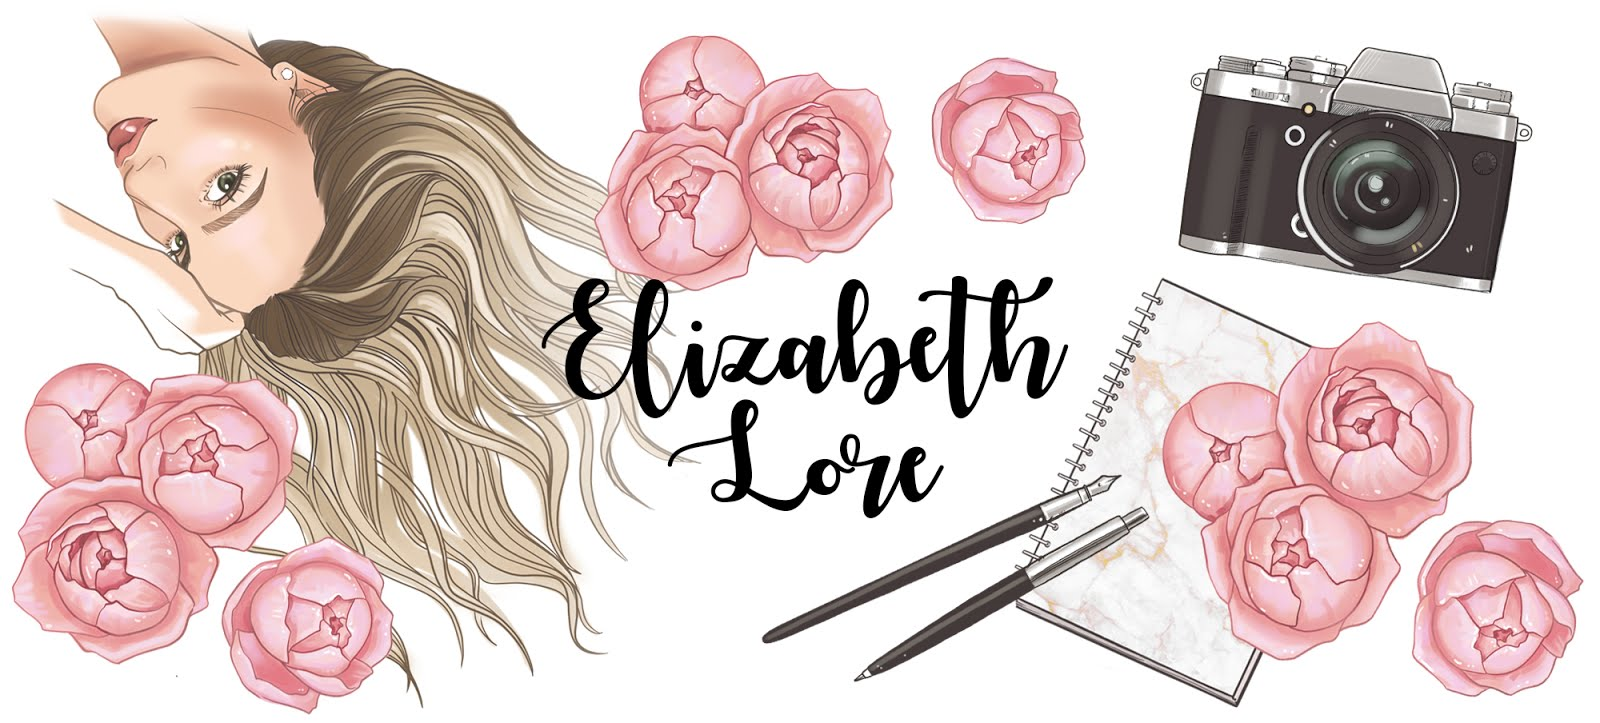 Elizabeth Lore